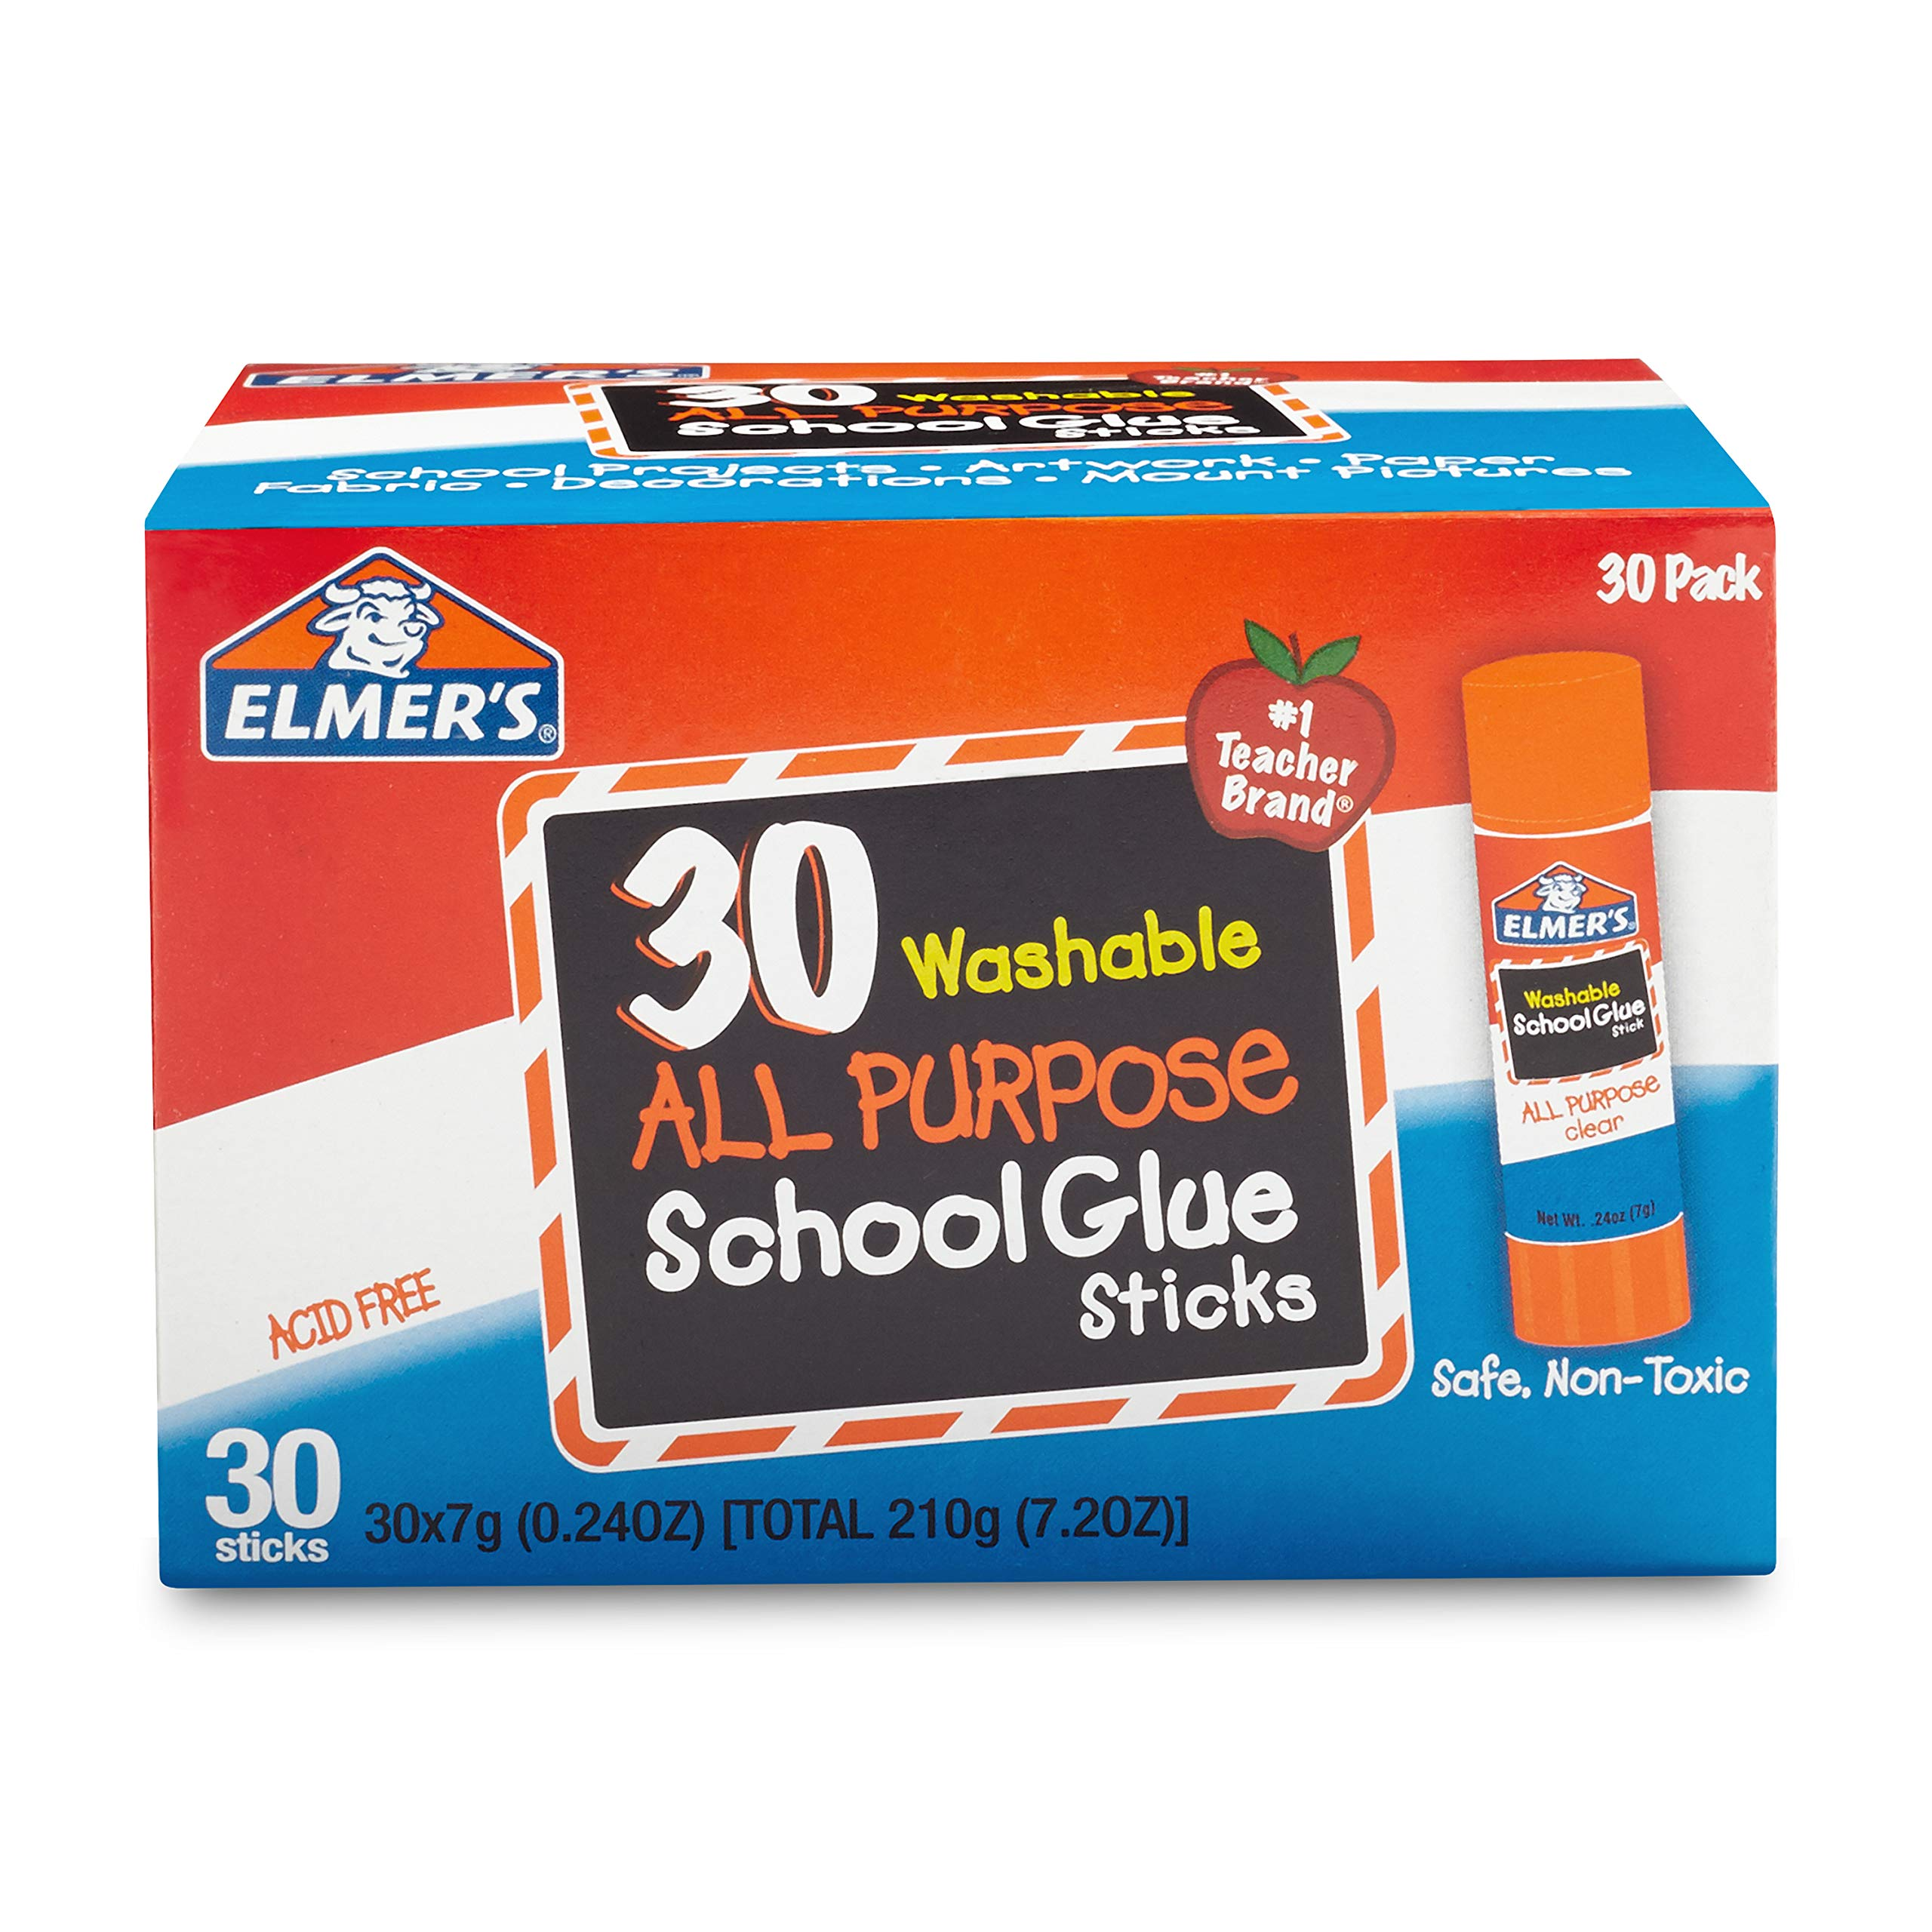 Elmer's All Purpose School Glue Sticks, Washable, 7 Gram, 30 Count by Elmer's